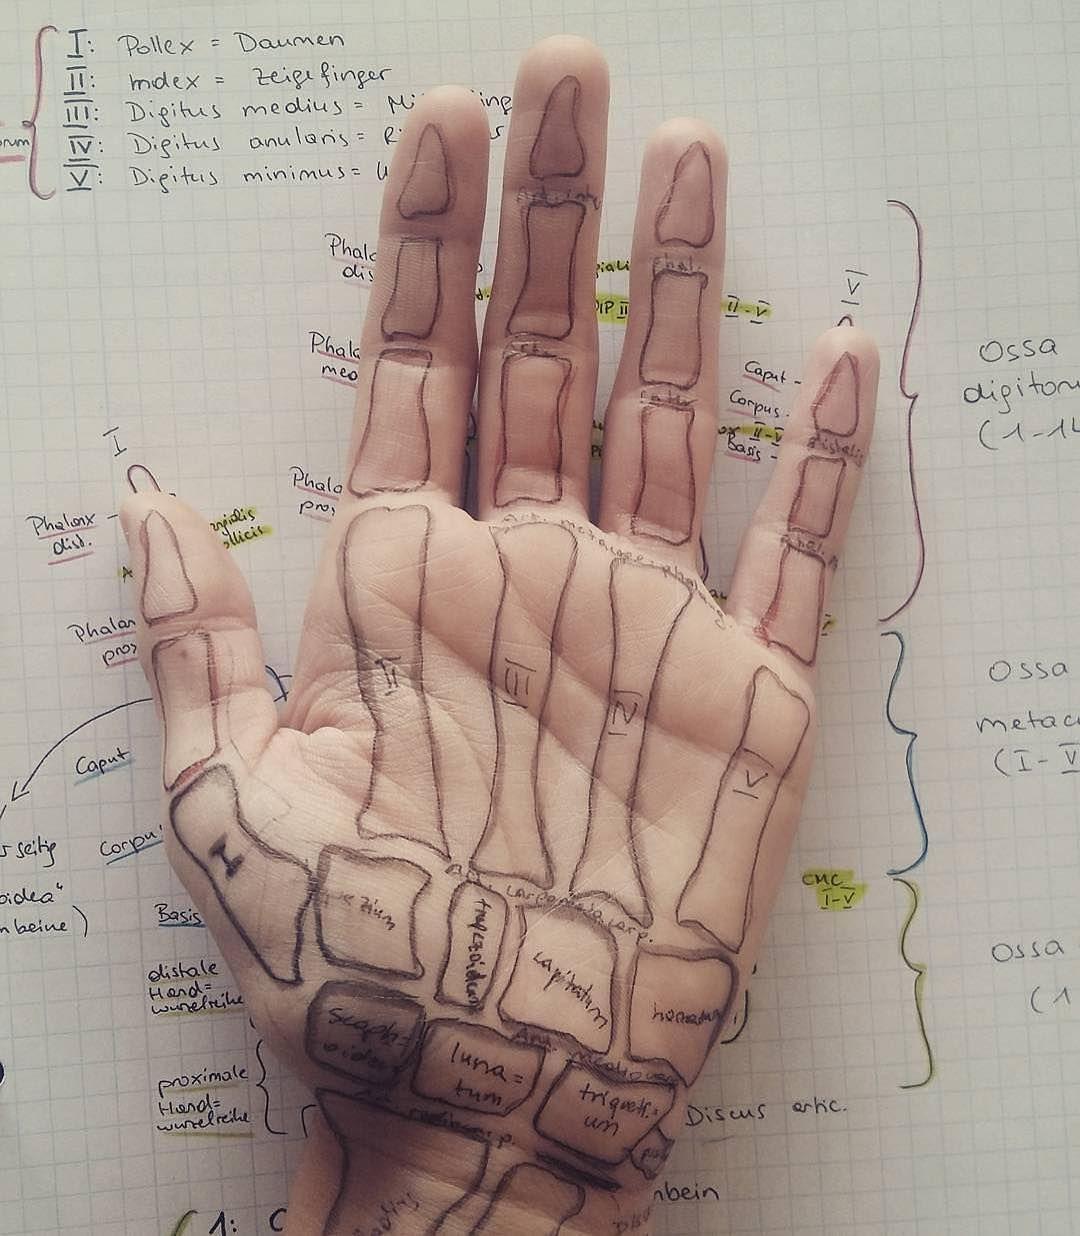 Really Creative idea easy way to learn anatomy Photo credit: Ronja ...